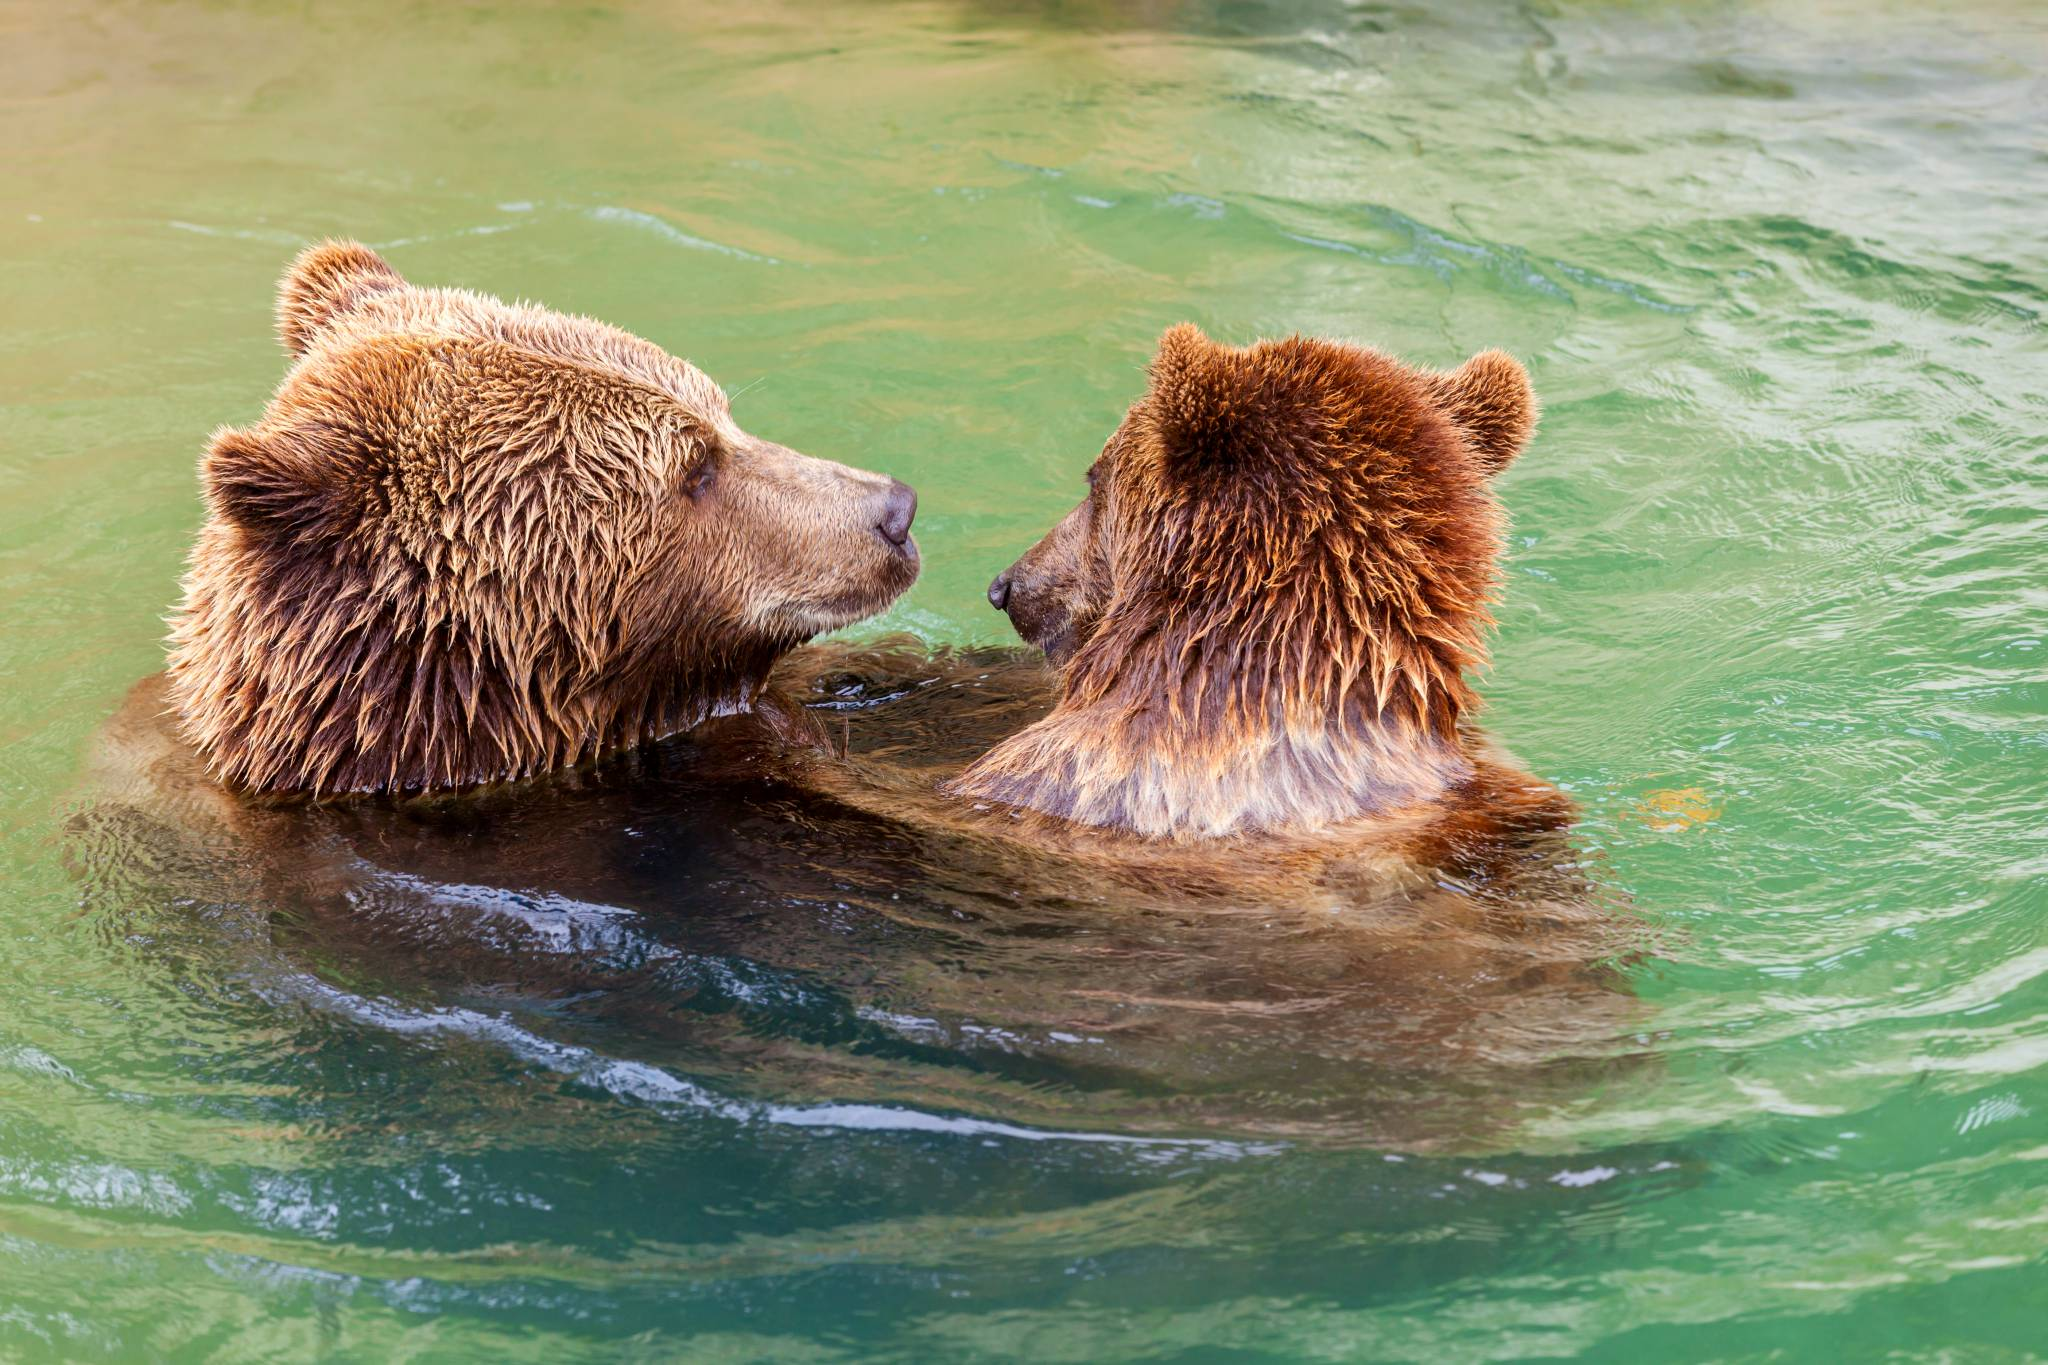 So sweet! Bern BearPark!